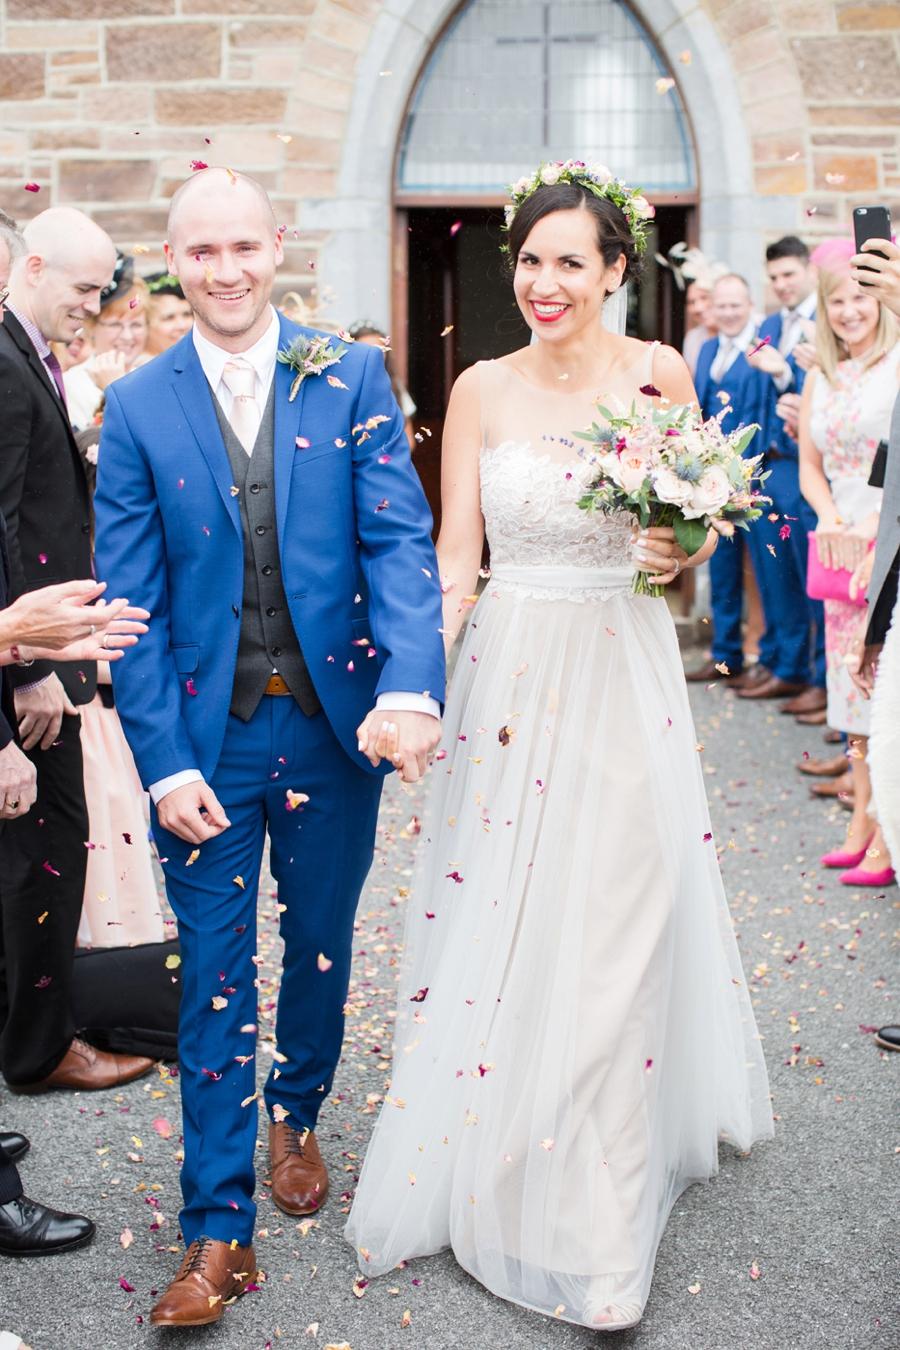 cc8be6c2712e Bröllop på Irland i ljusa pastelltoner   Those Lovely Days